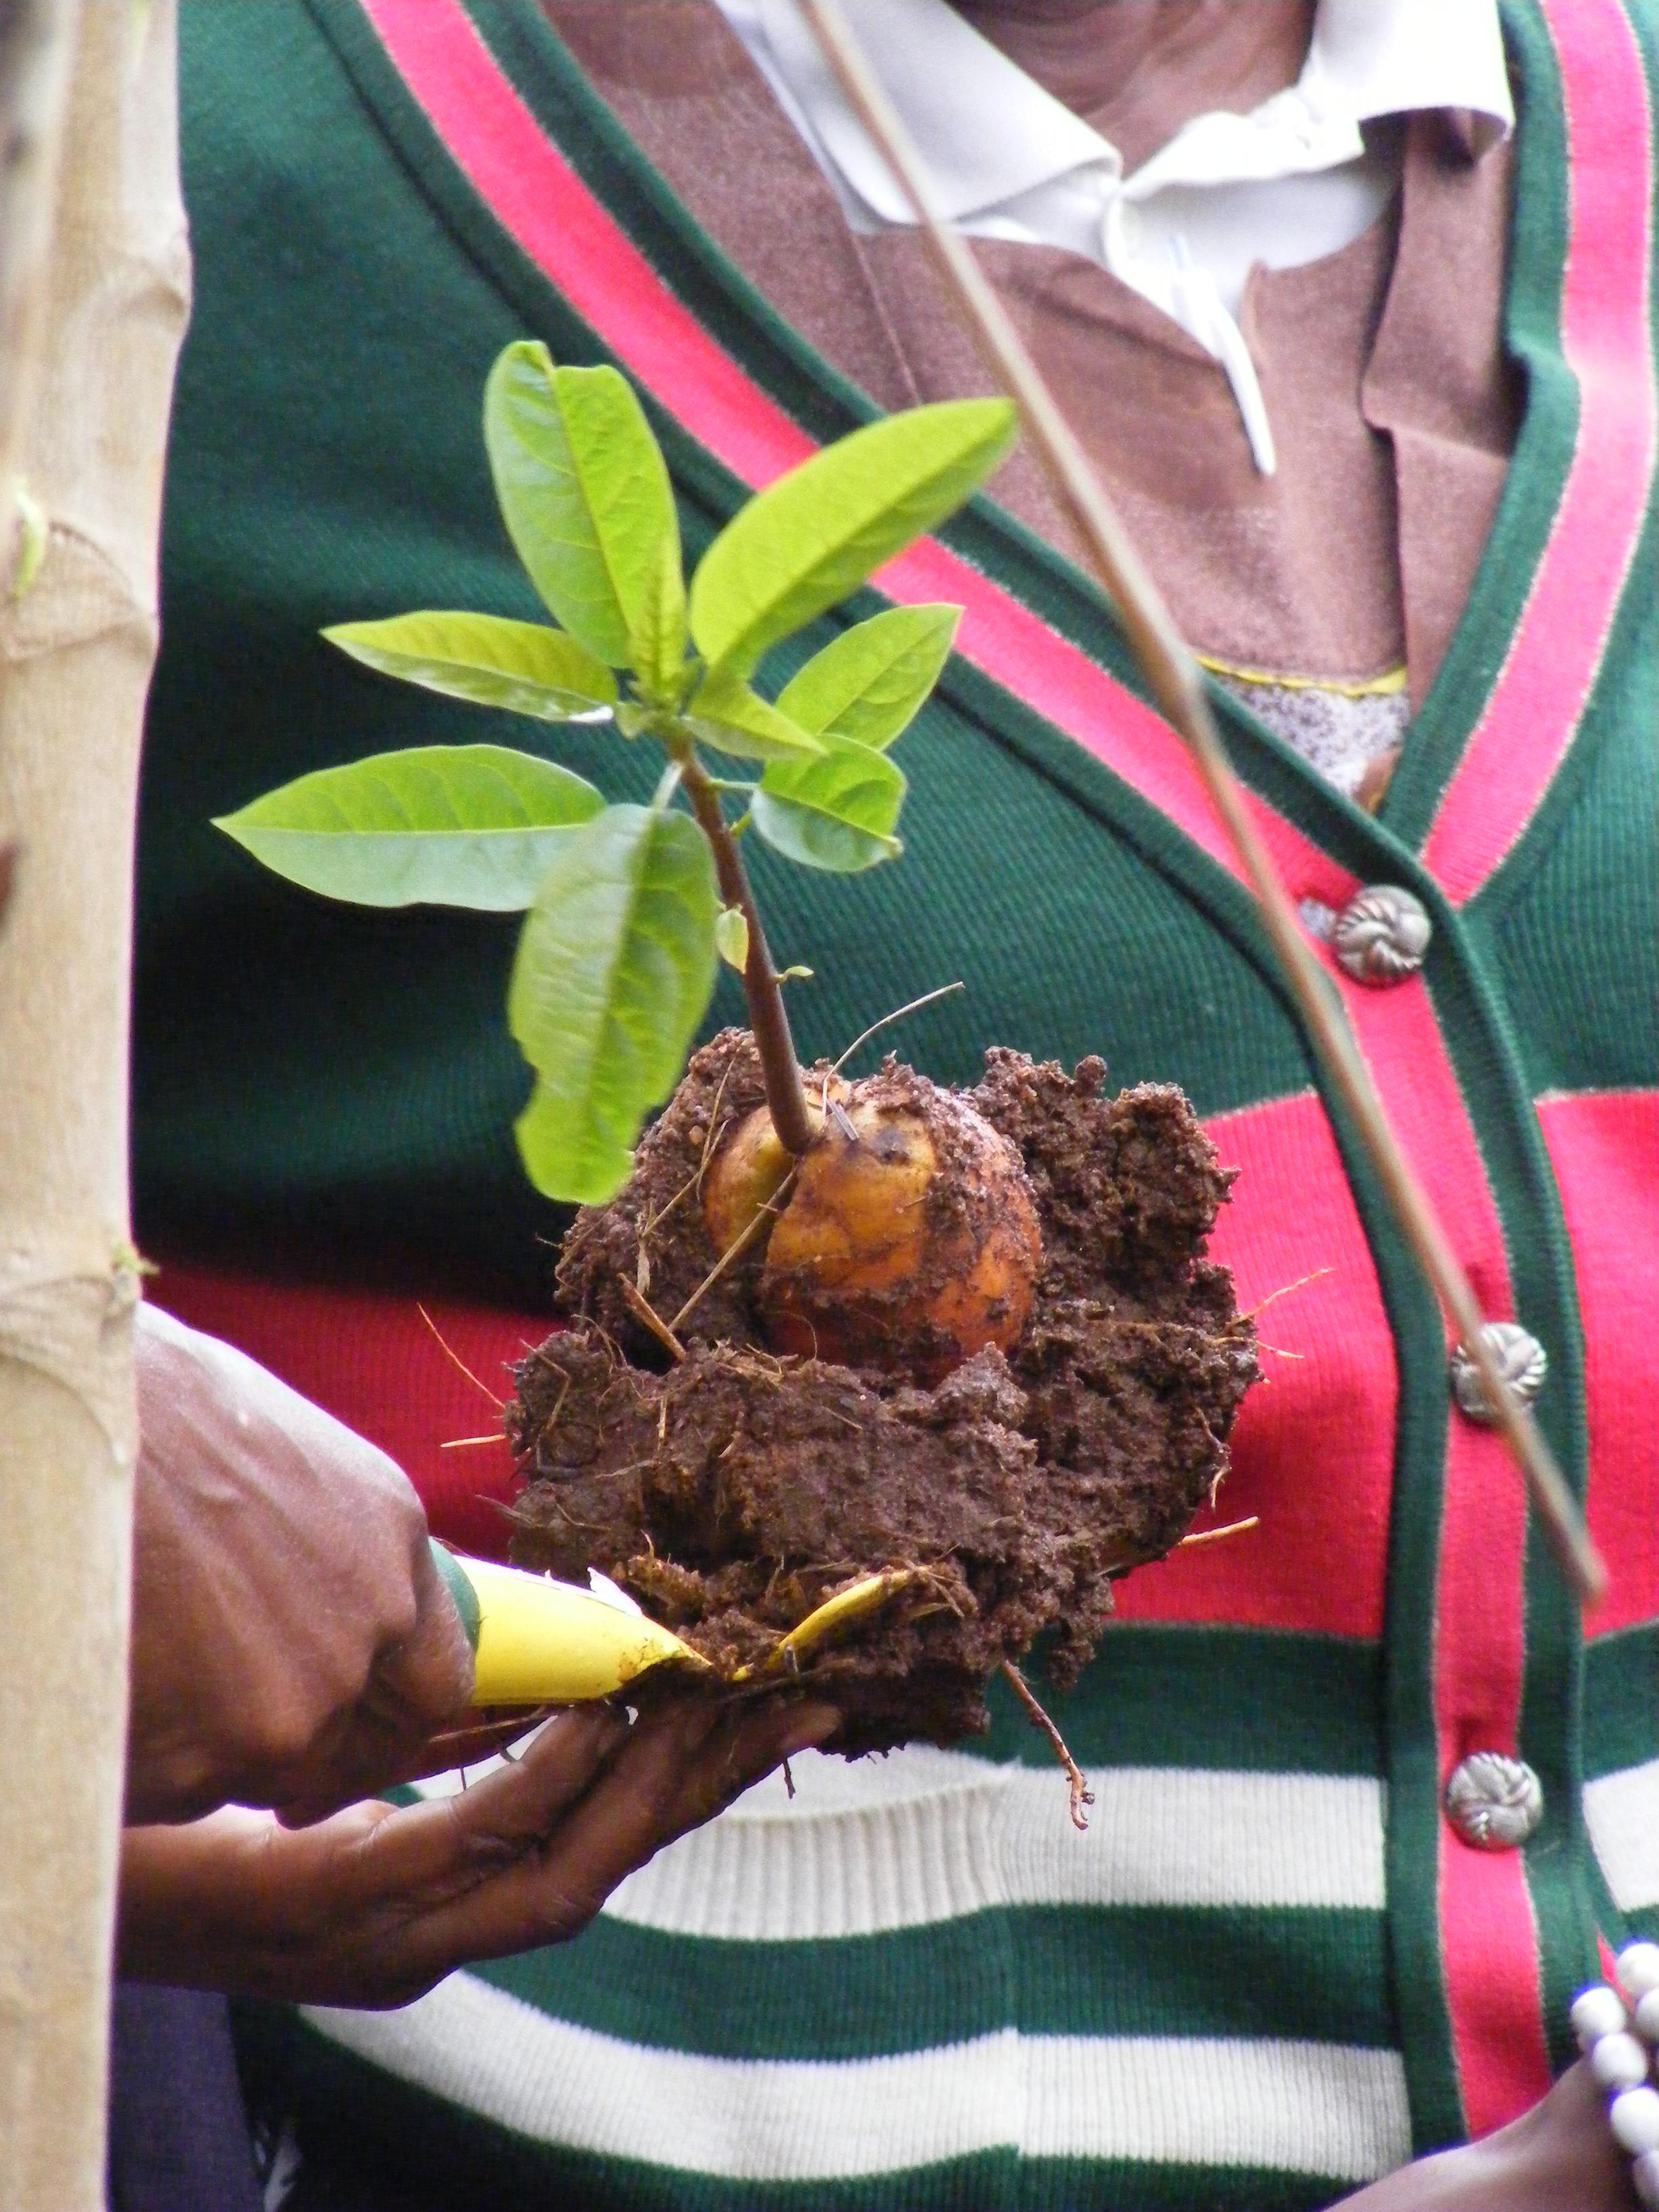 avocado sapling - bagging up.JPG